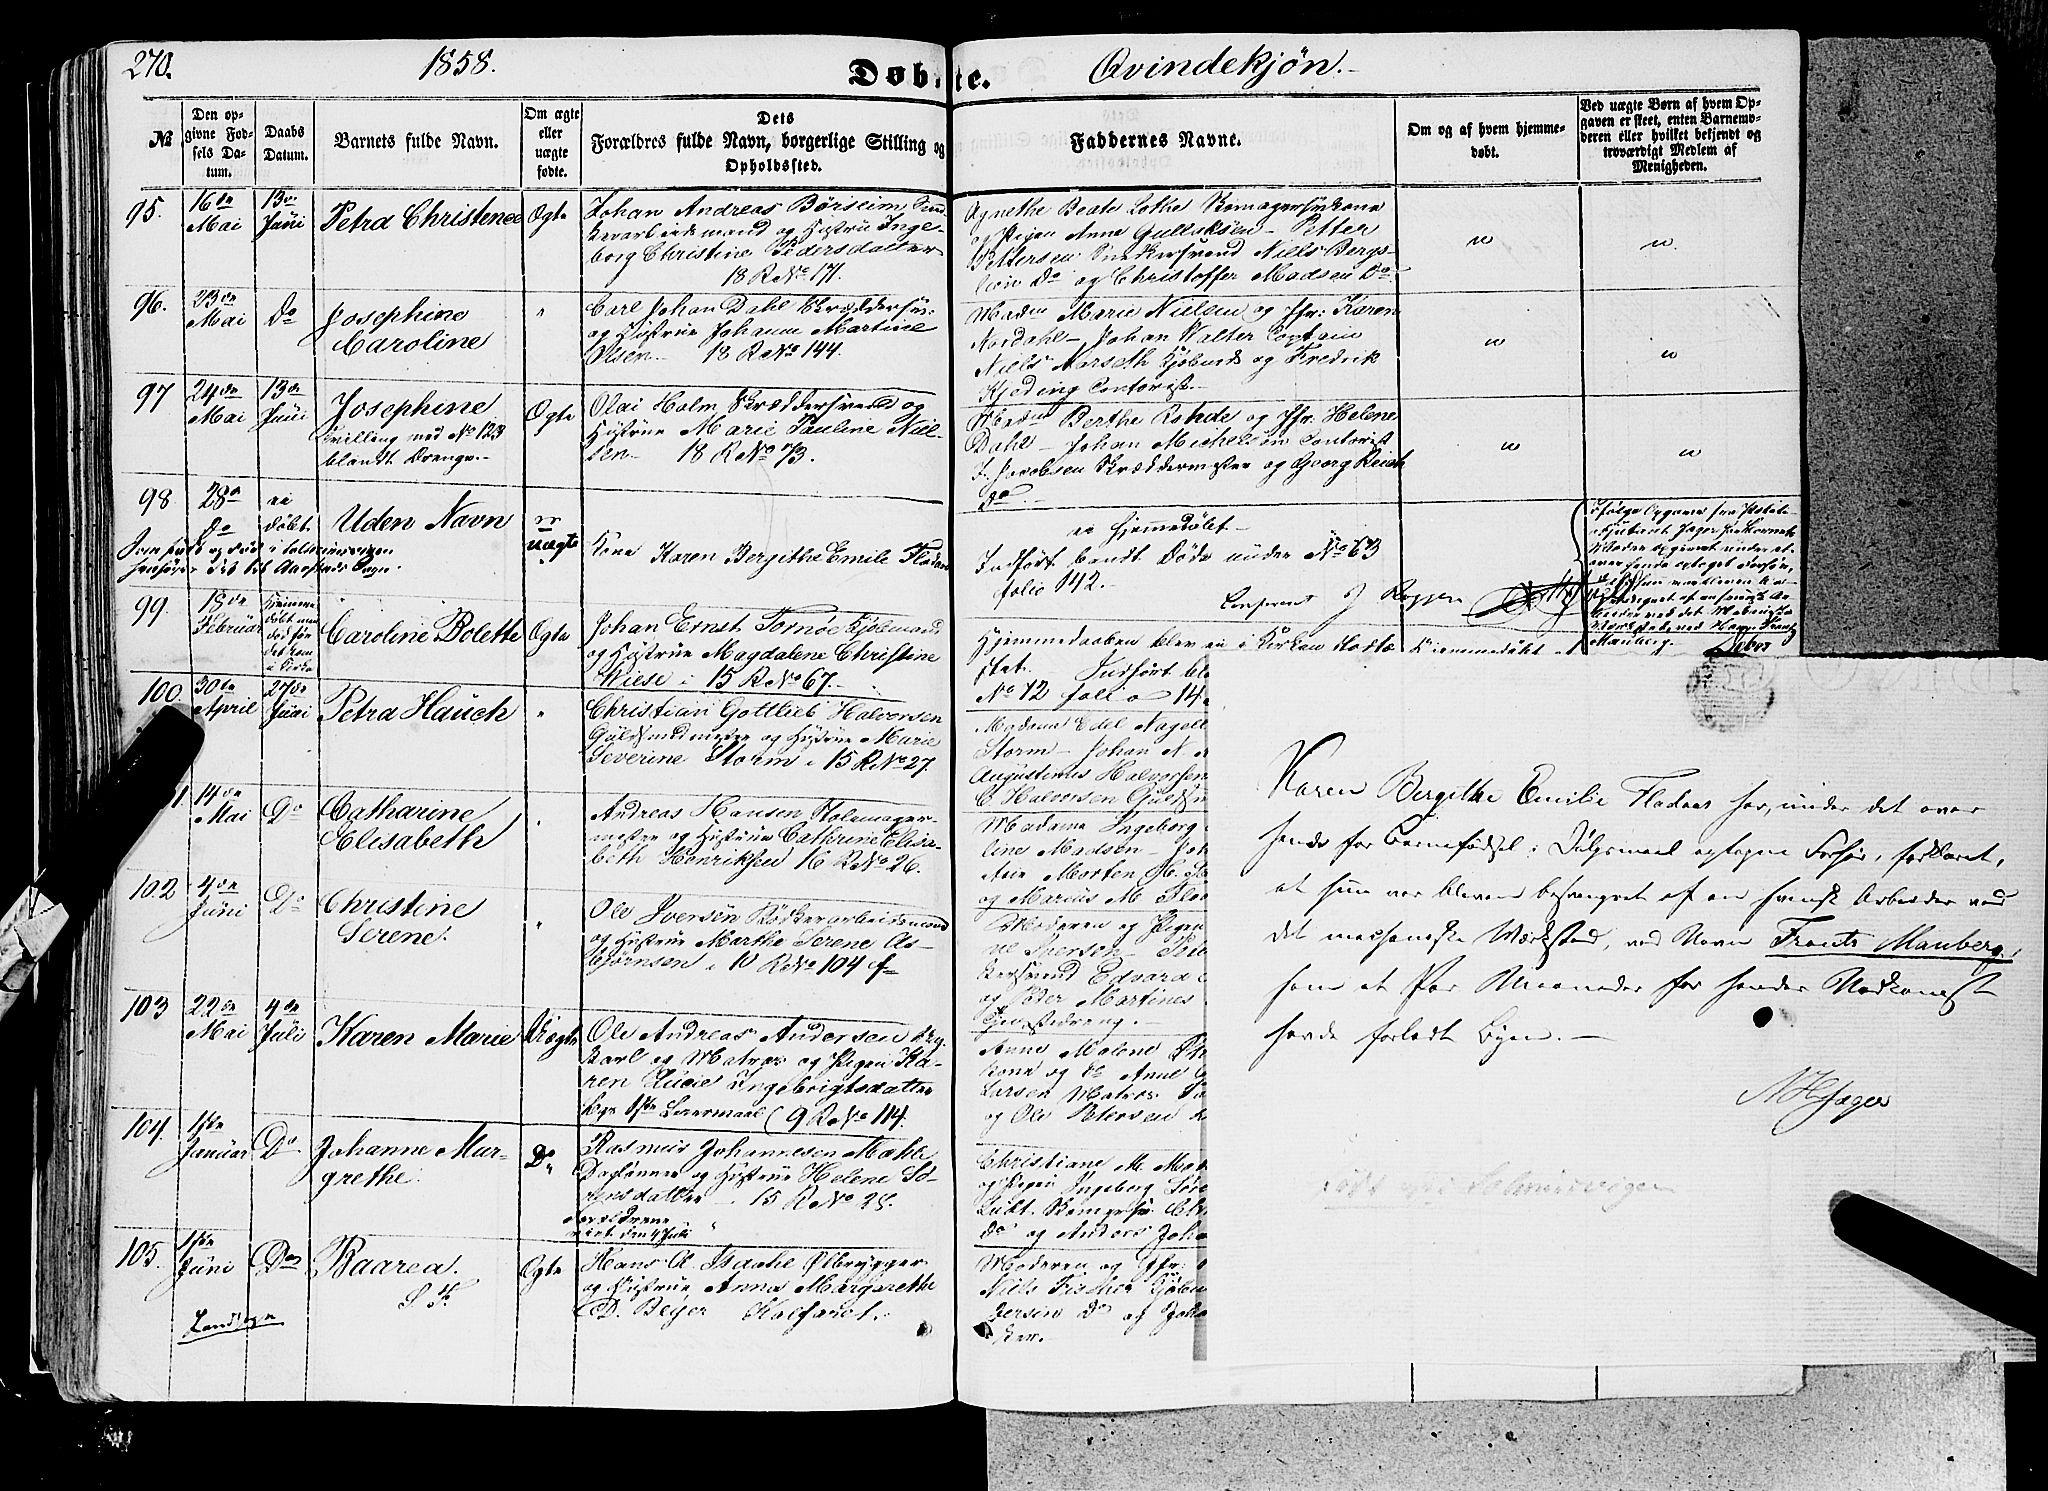 SAB, Domkirken Sokneprestembete, H/Haa/L0020: Ministerialbok nr. B 3, 1851-1859, s. 270